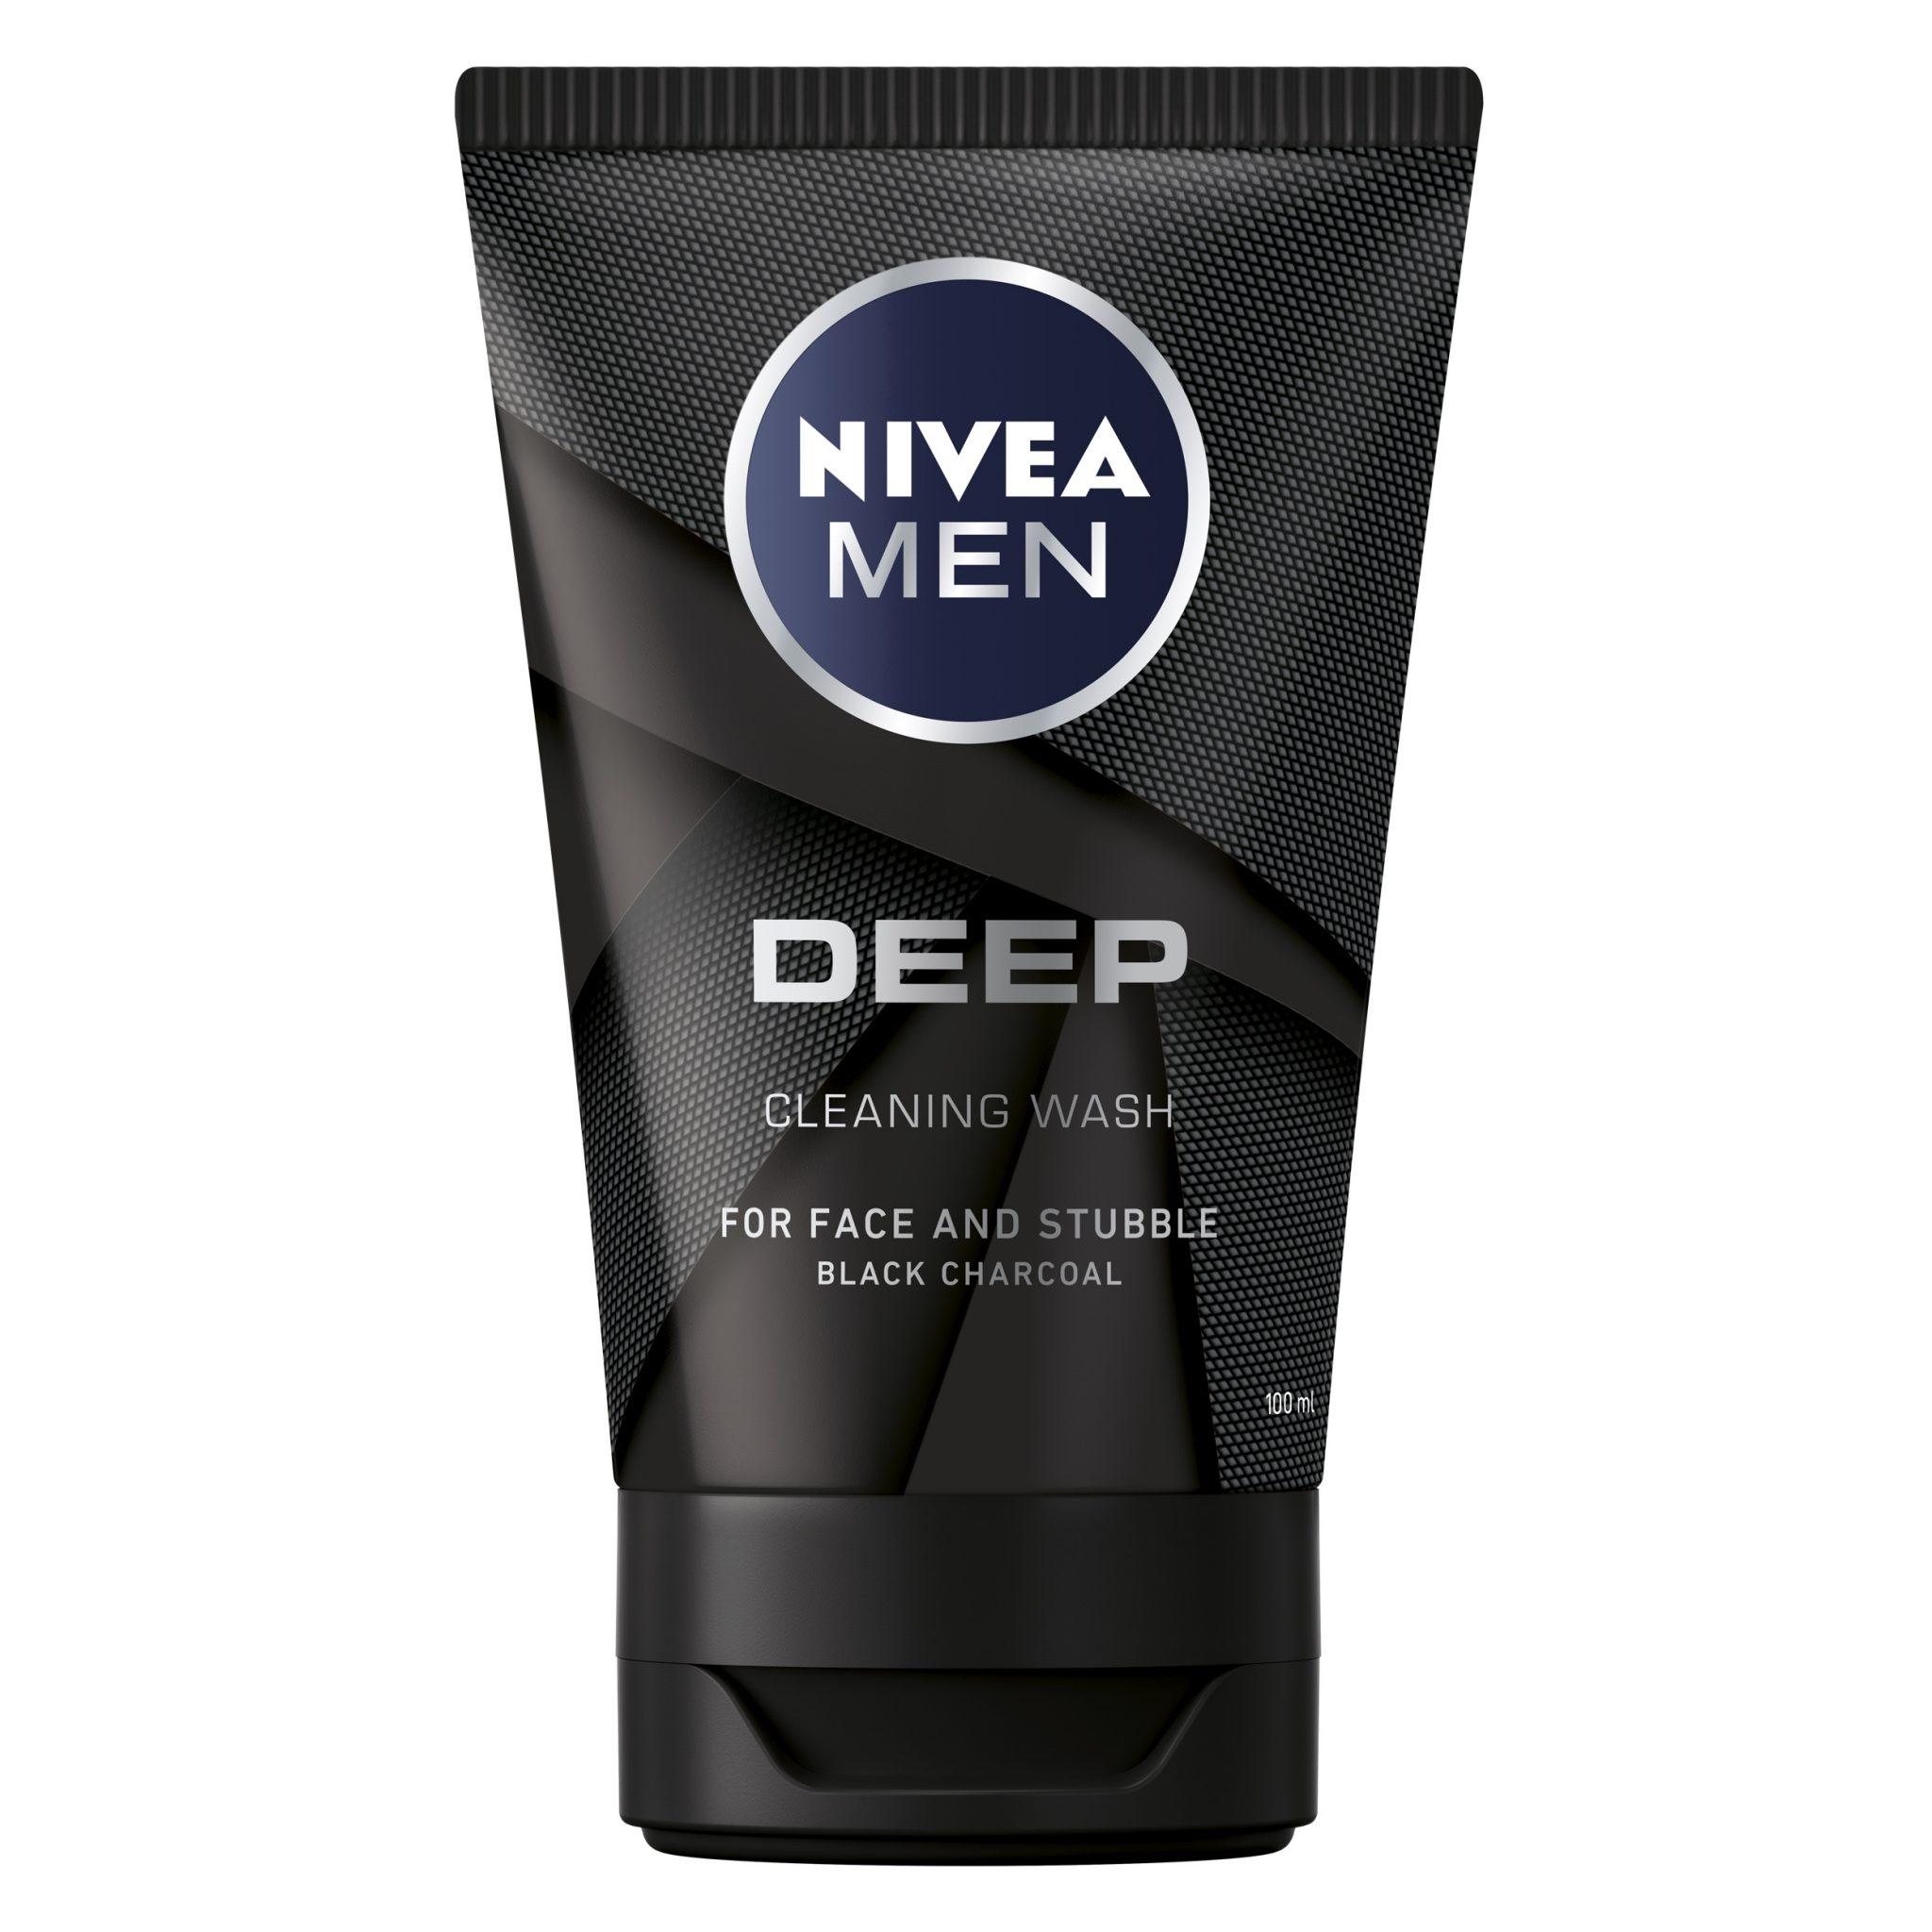 81787_NIVEA_MEN_DEEP_Cleansing_Wash_Tube_100ml